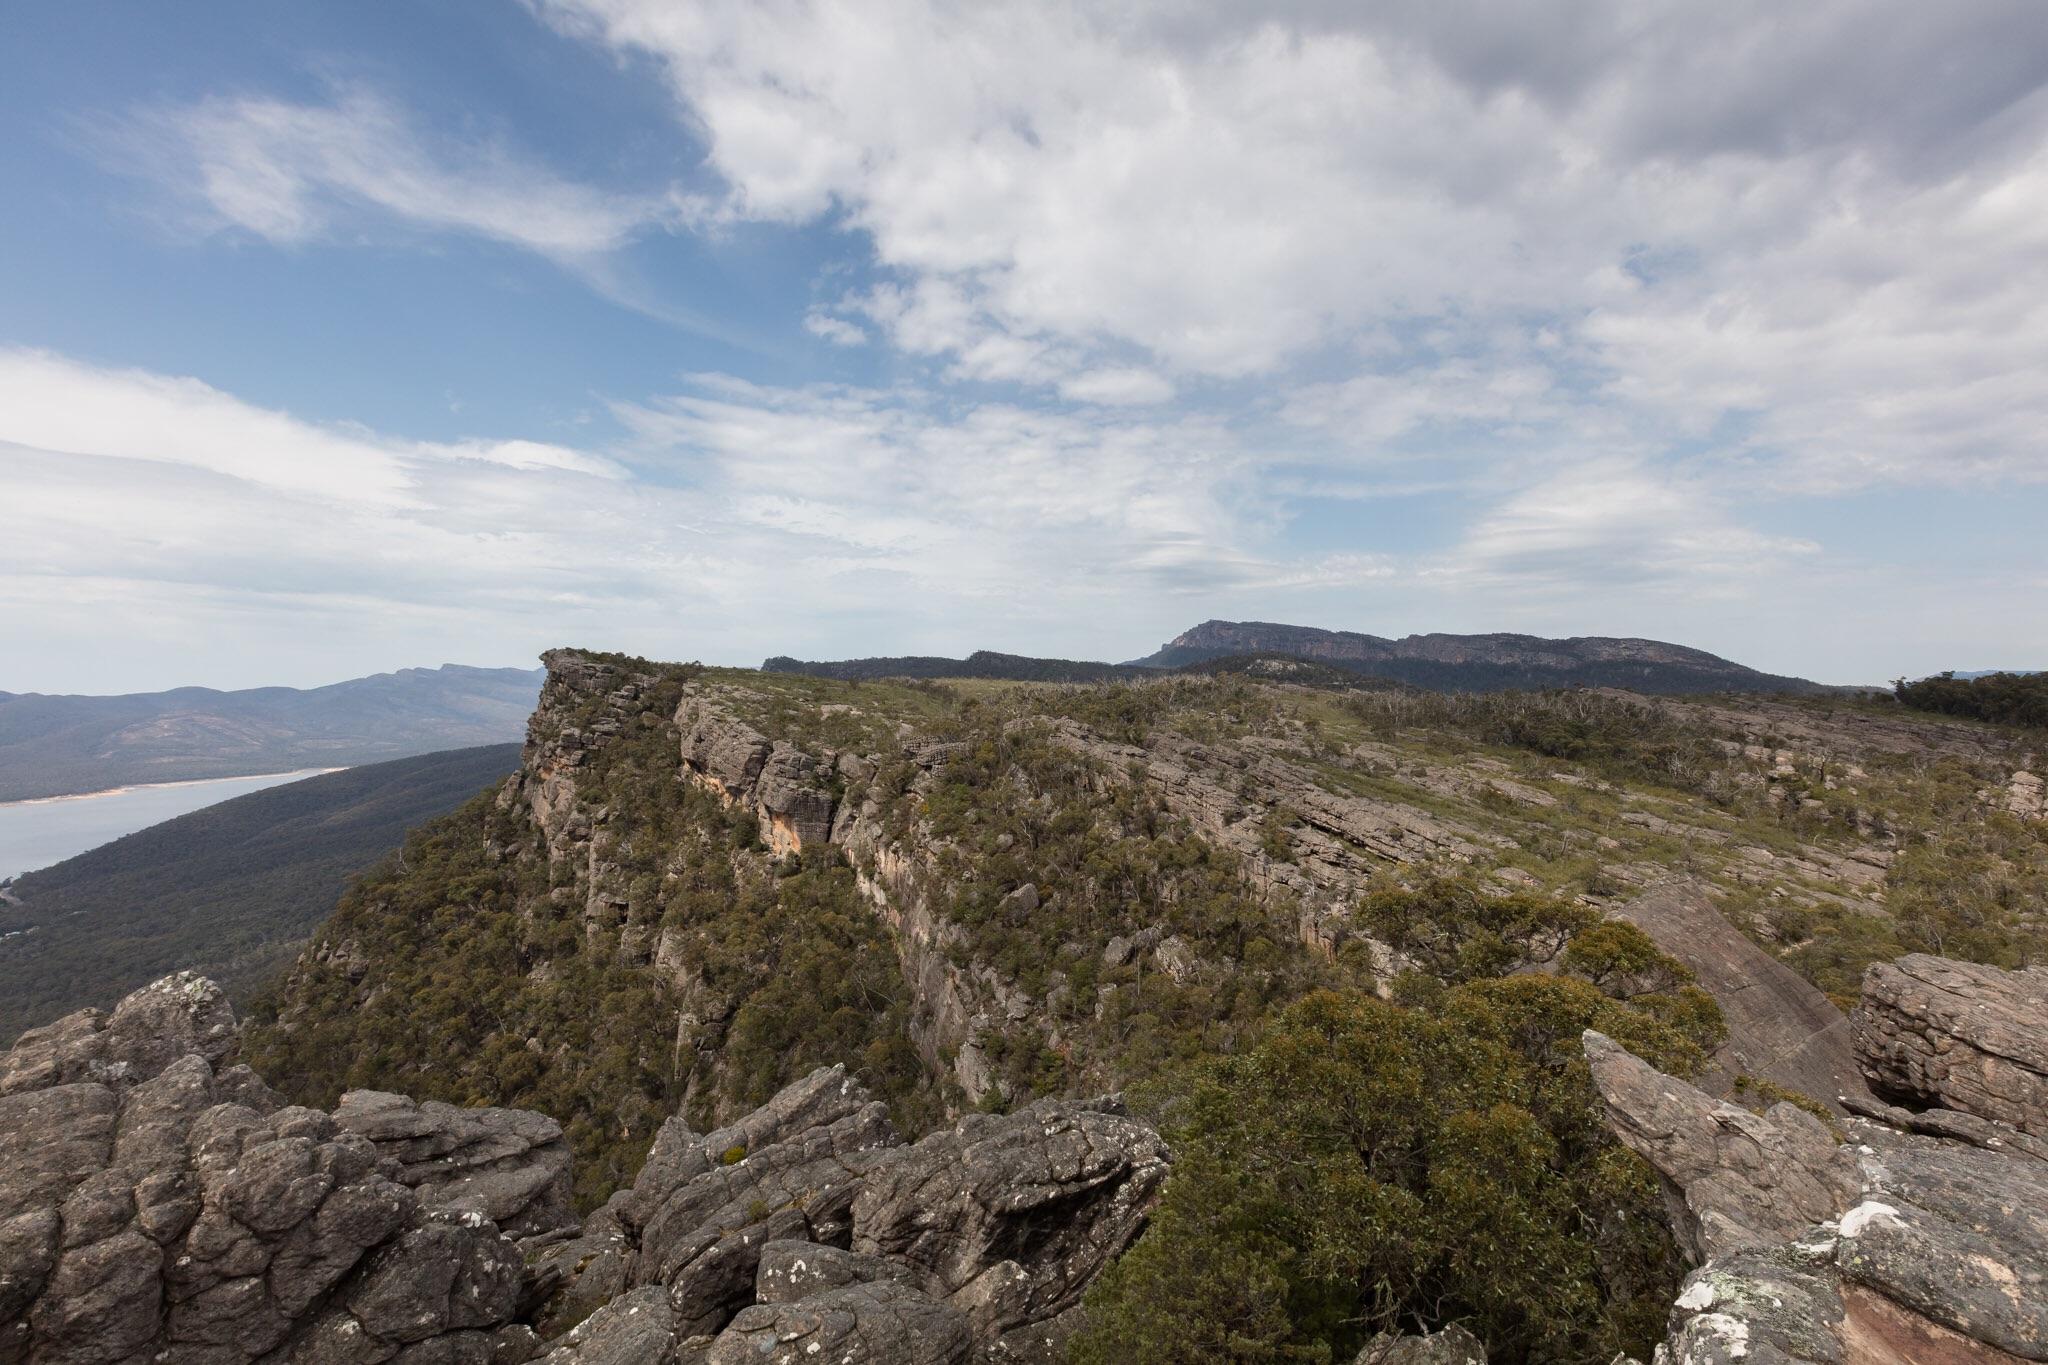 james unthank grampians national park this world exists thisworldexists australia